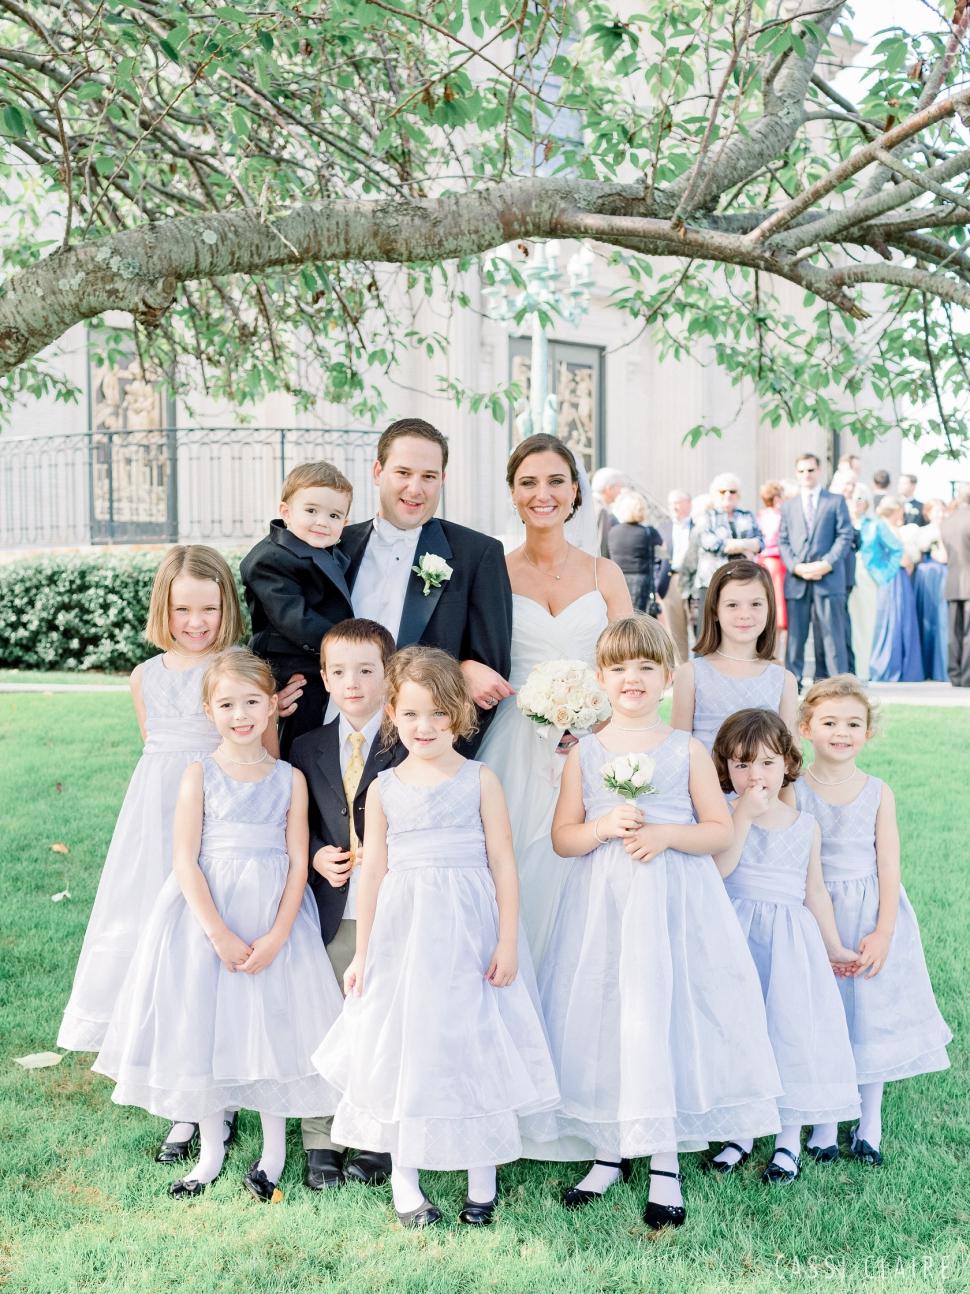 Spring-Lake-Bath-and-Tennis-Club-Wedding-Photos-St-Catherines-Wedding-New-Jersey_14.jpg